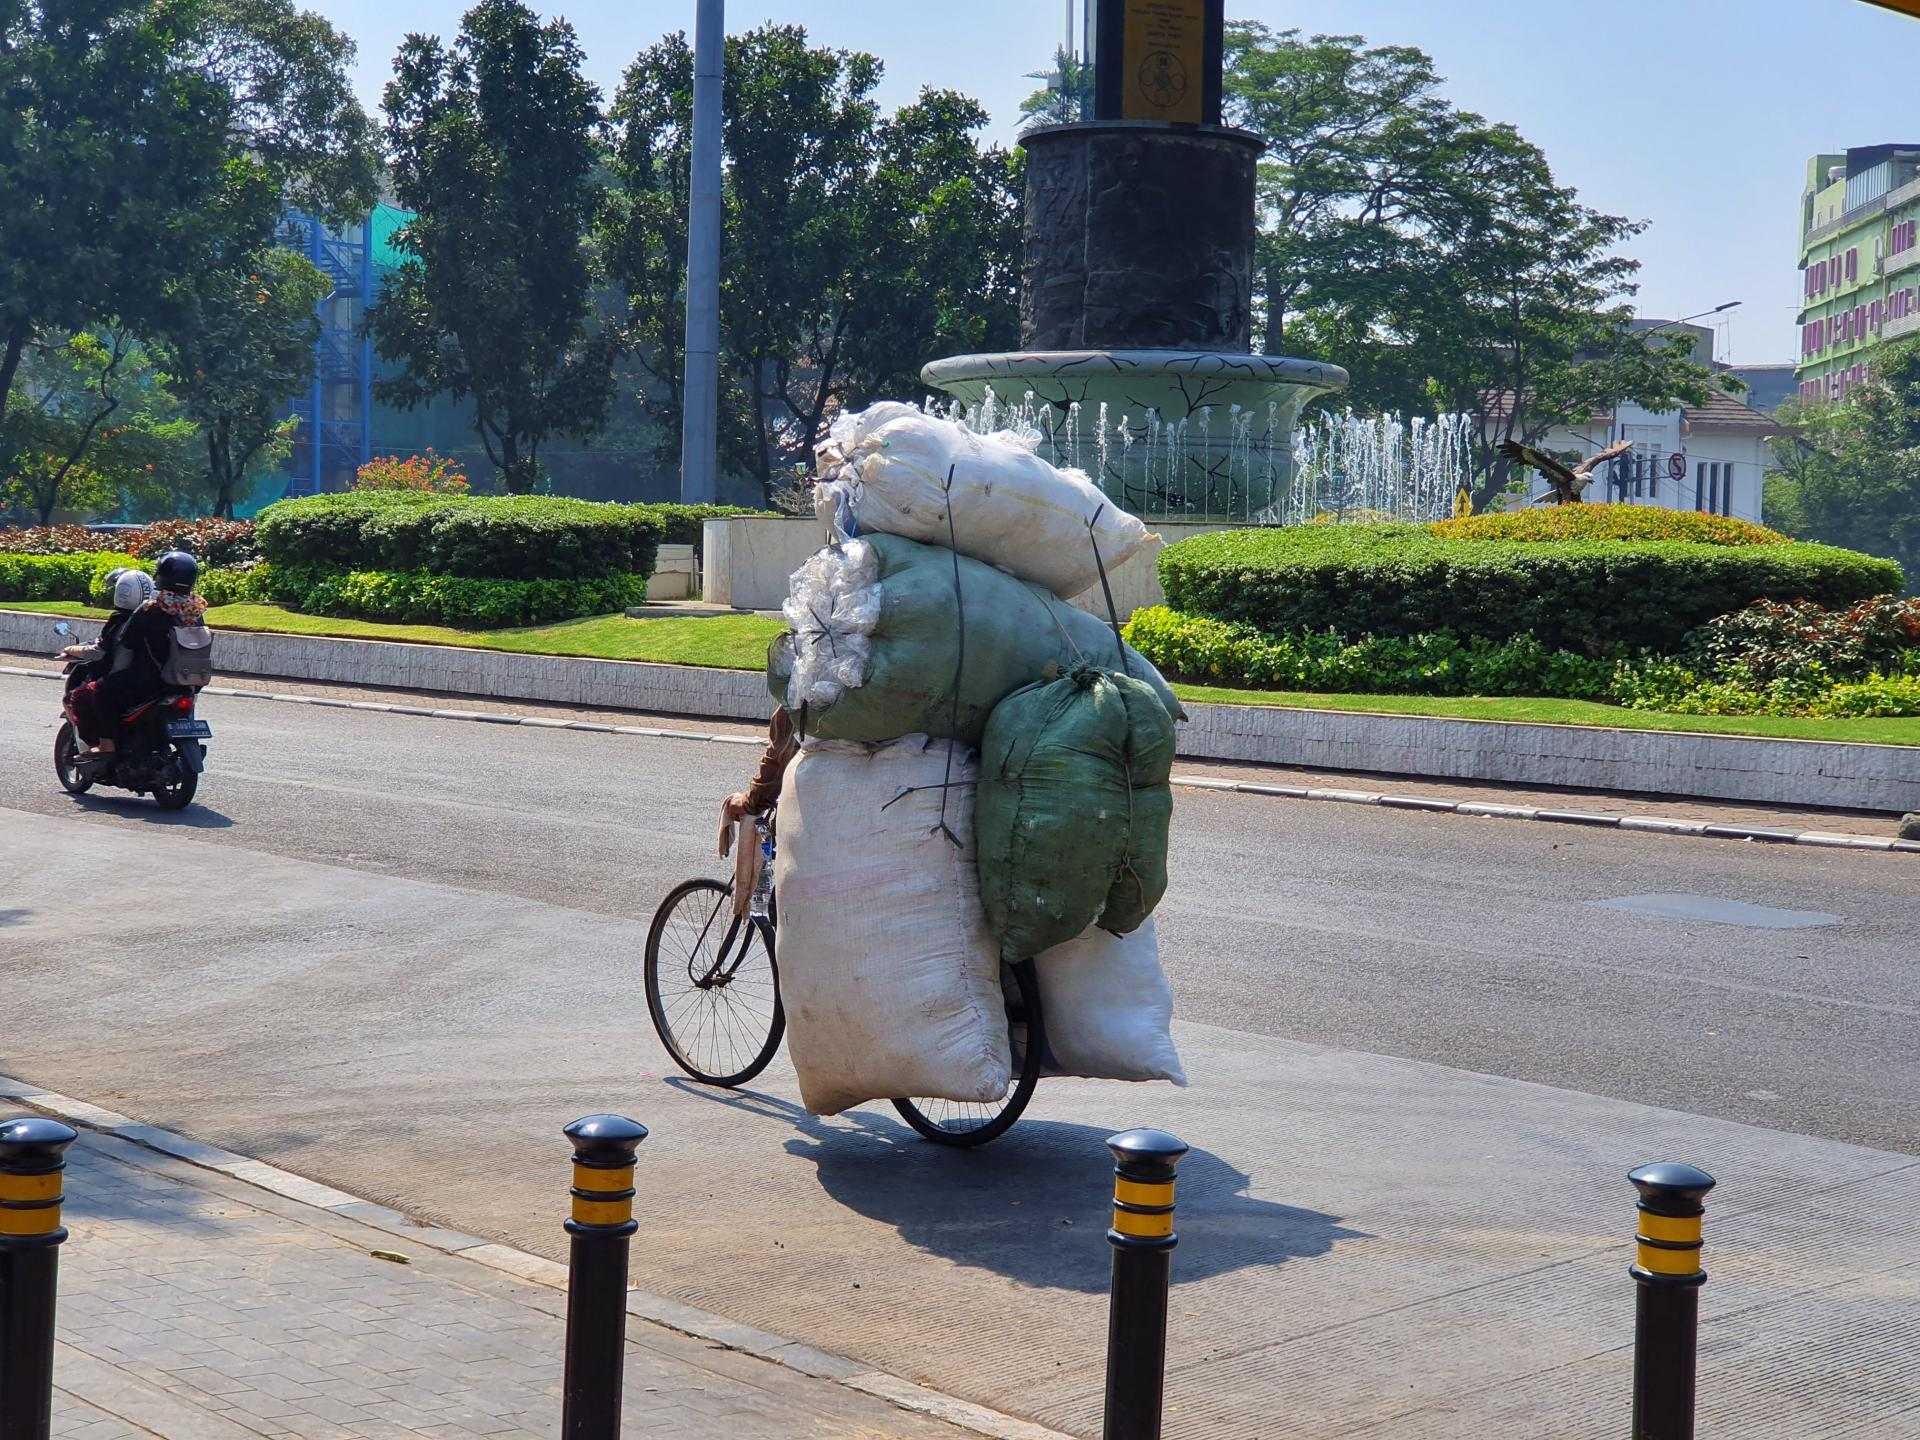 перевозка мешков на велосипеде в Азии